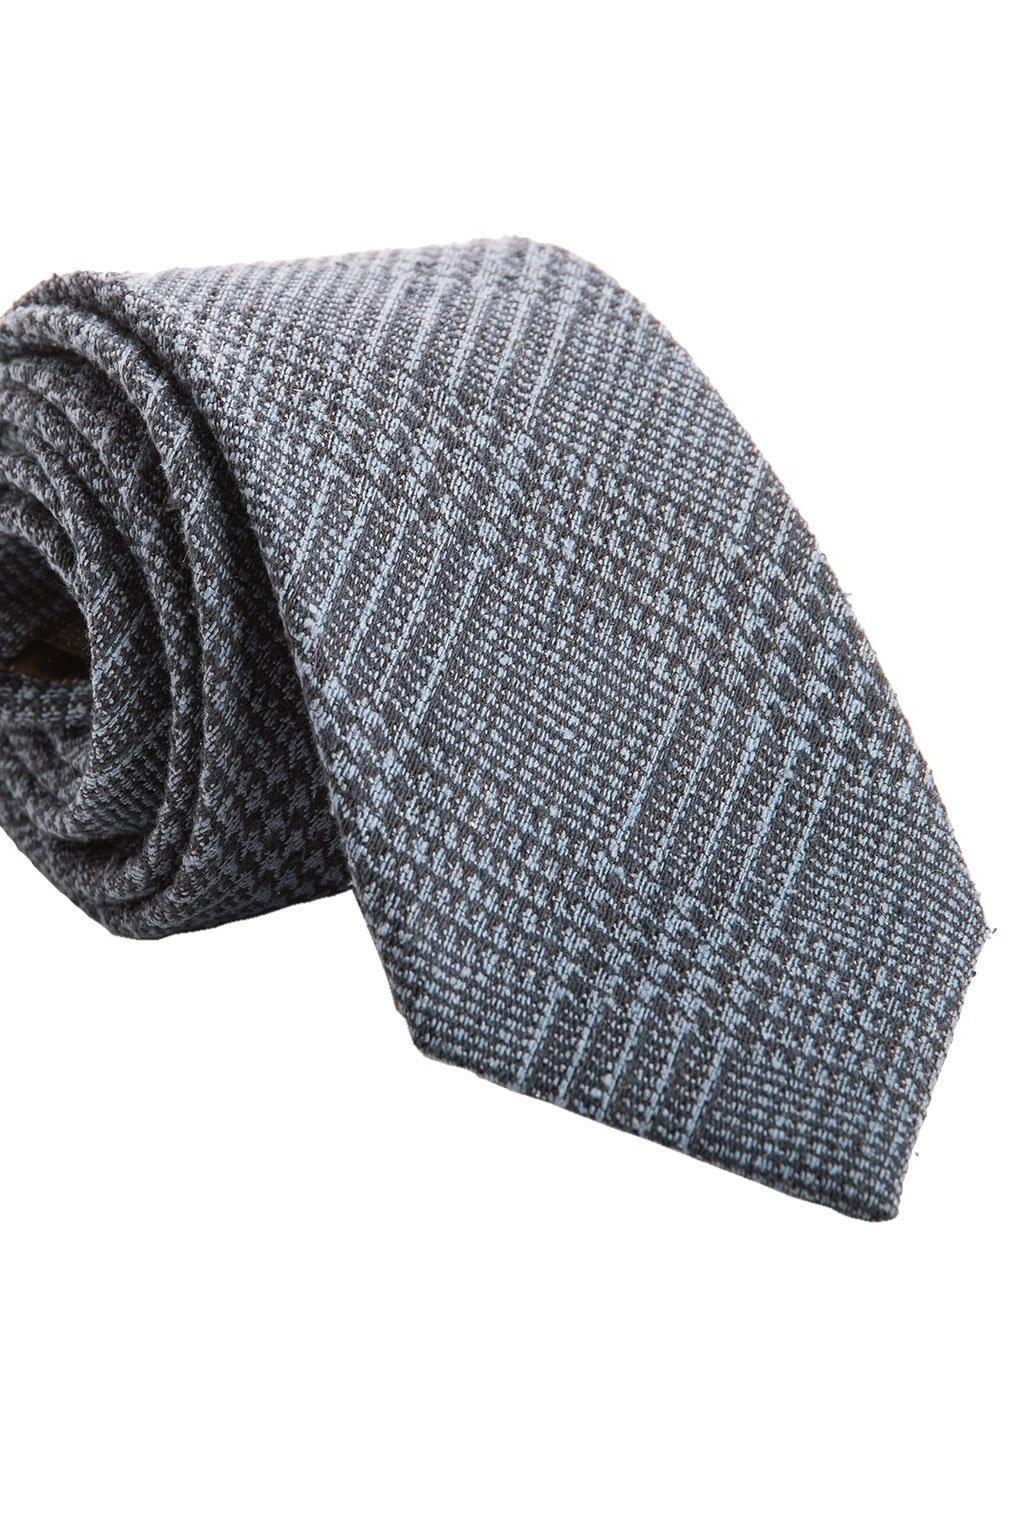 mens-luxury-blue-silk-bourette-italian-scarf_4f647e44-8524-407e-a380-c6374eeb298b.jpg